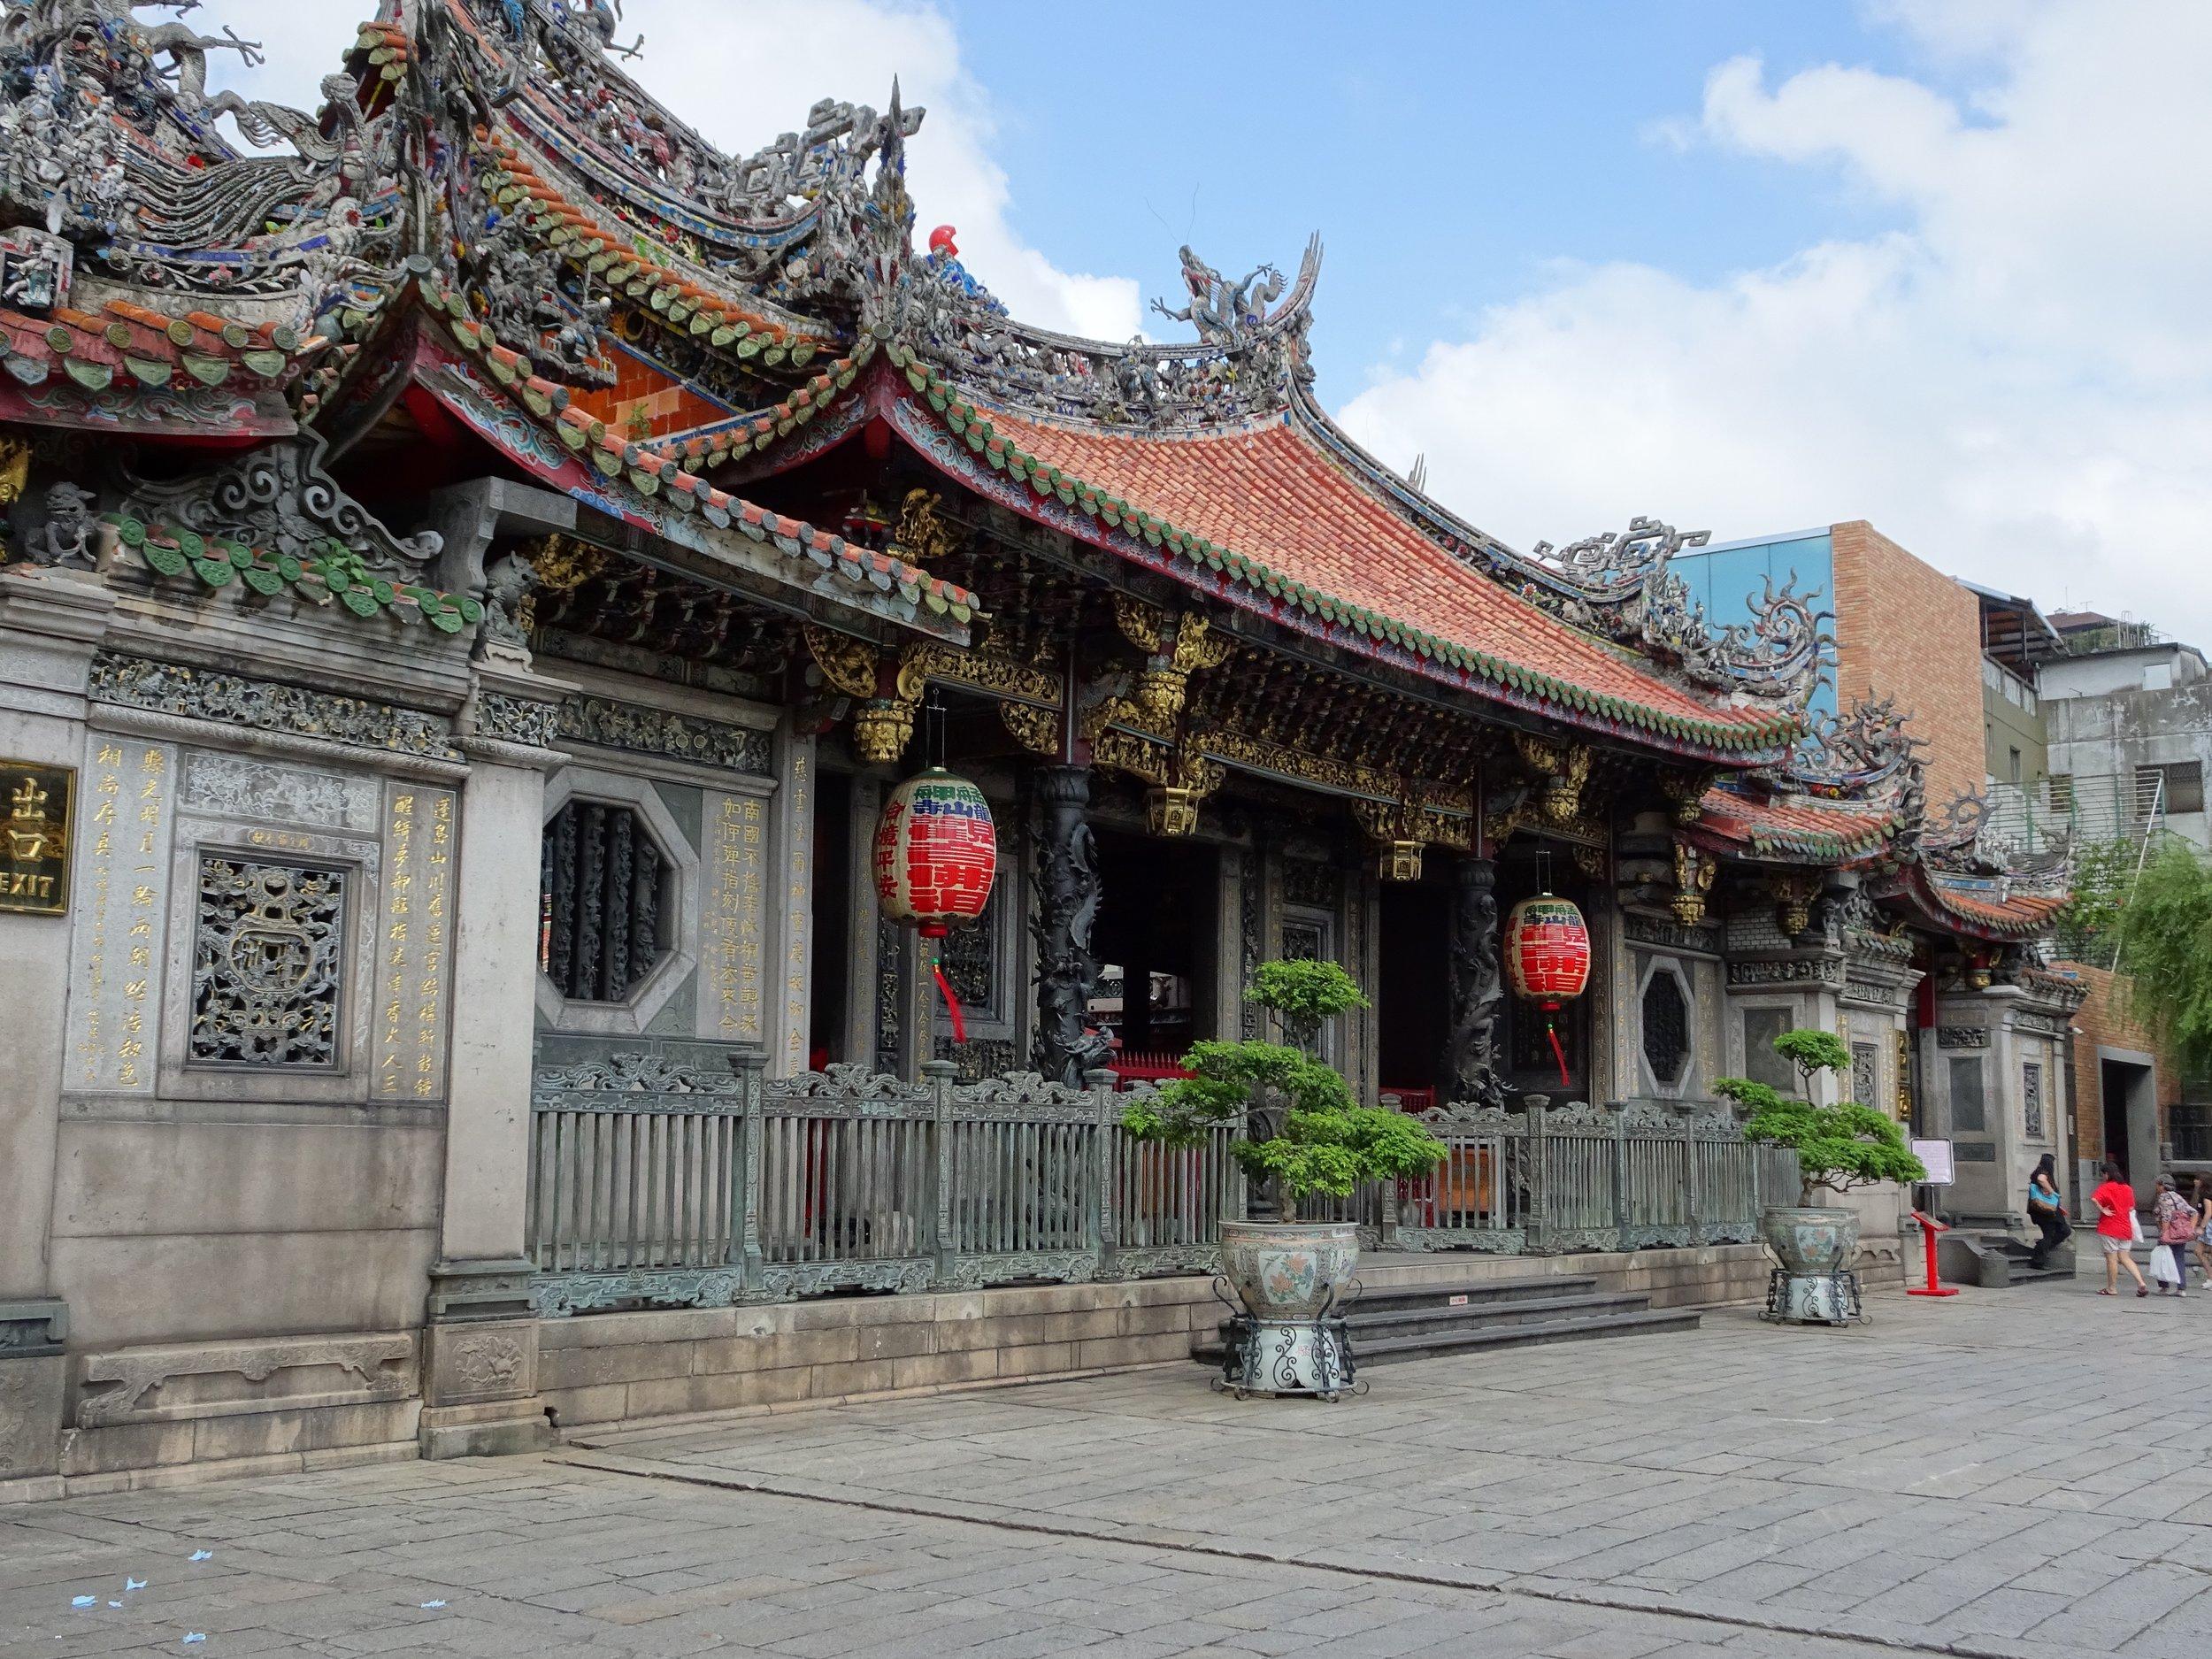 longshan temple in  TAIPEI, TAIWAN - M.QUGLEY